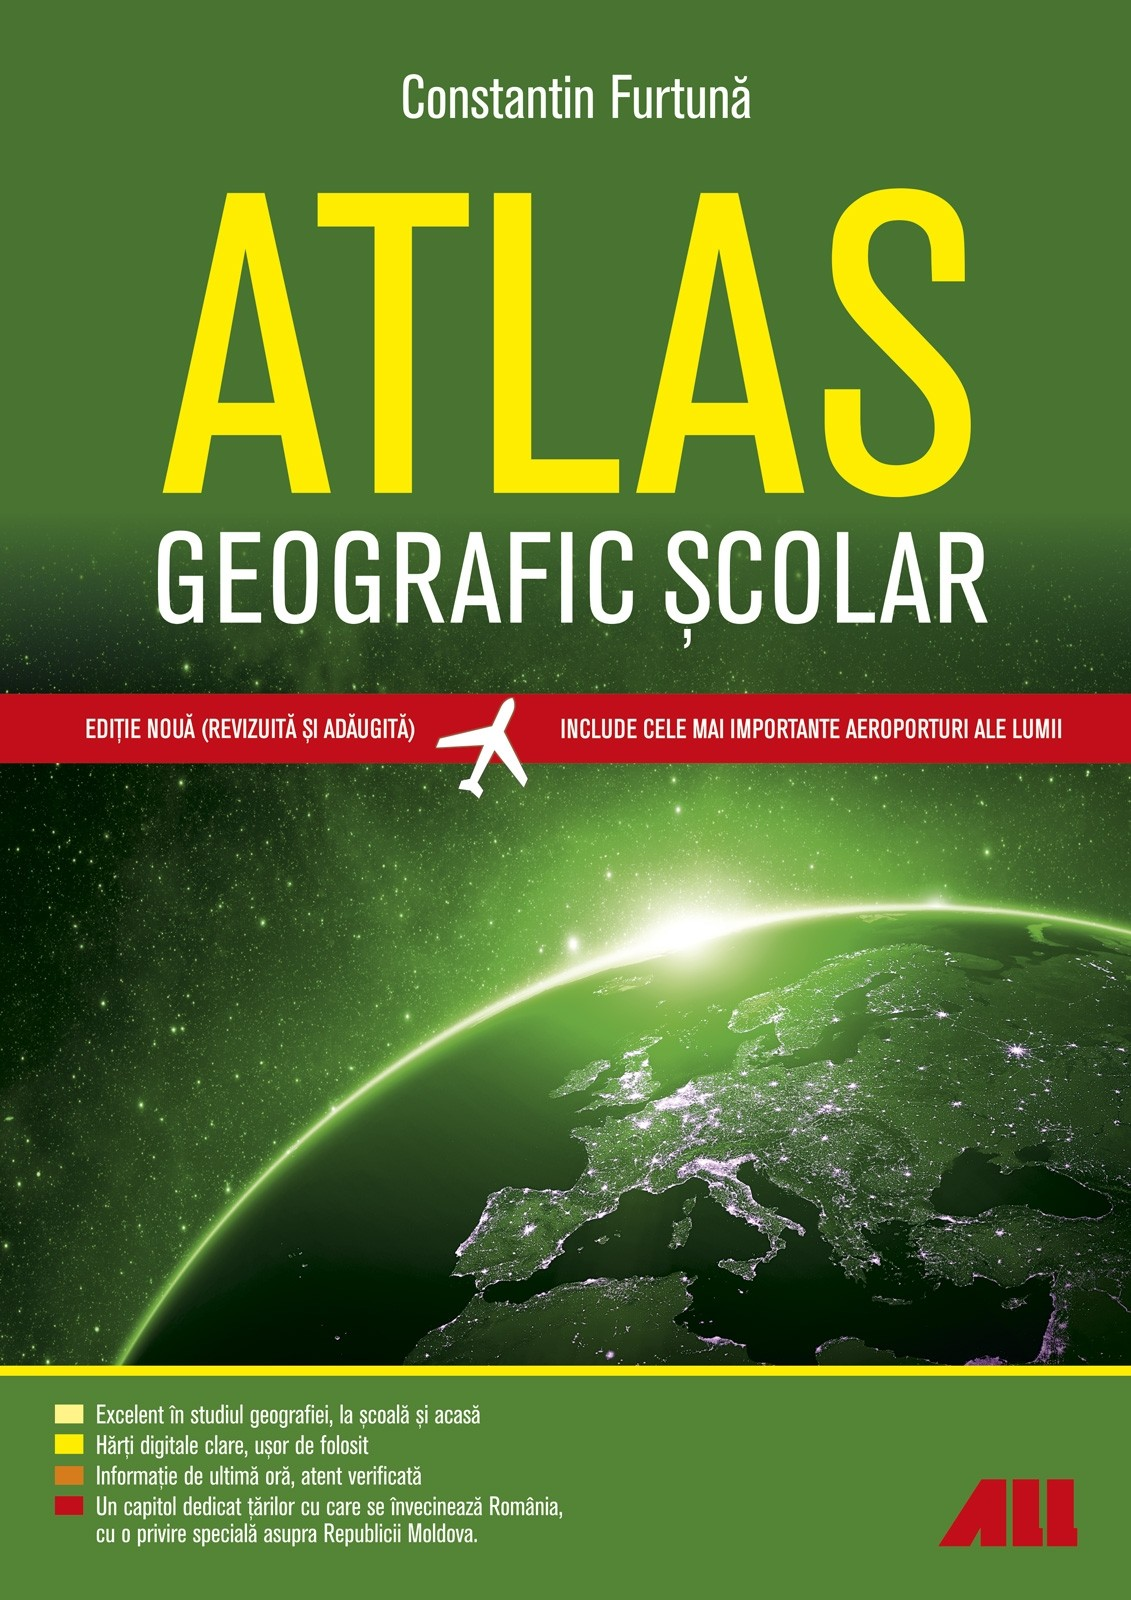 Atlas Geografic Scolar | Constantin Furtuna